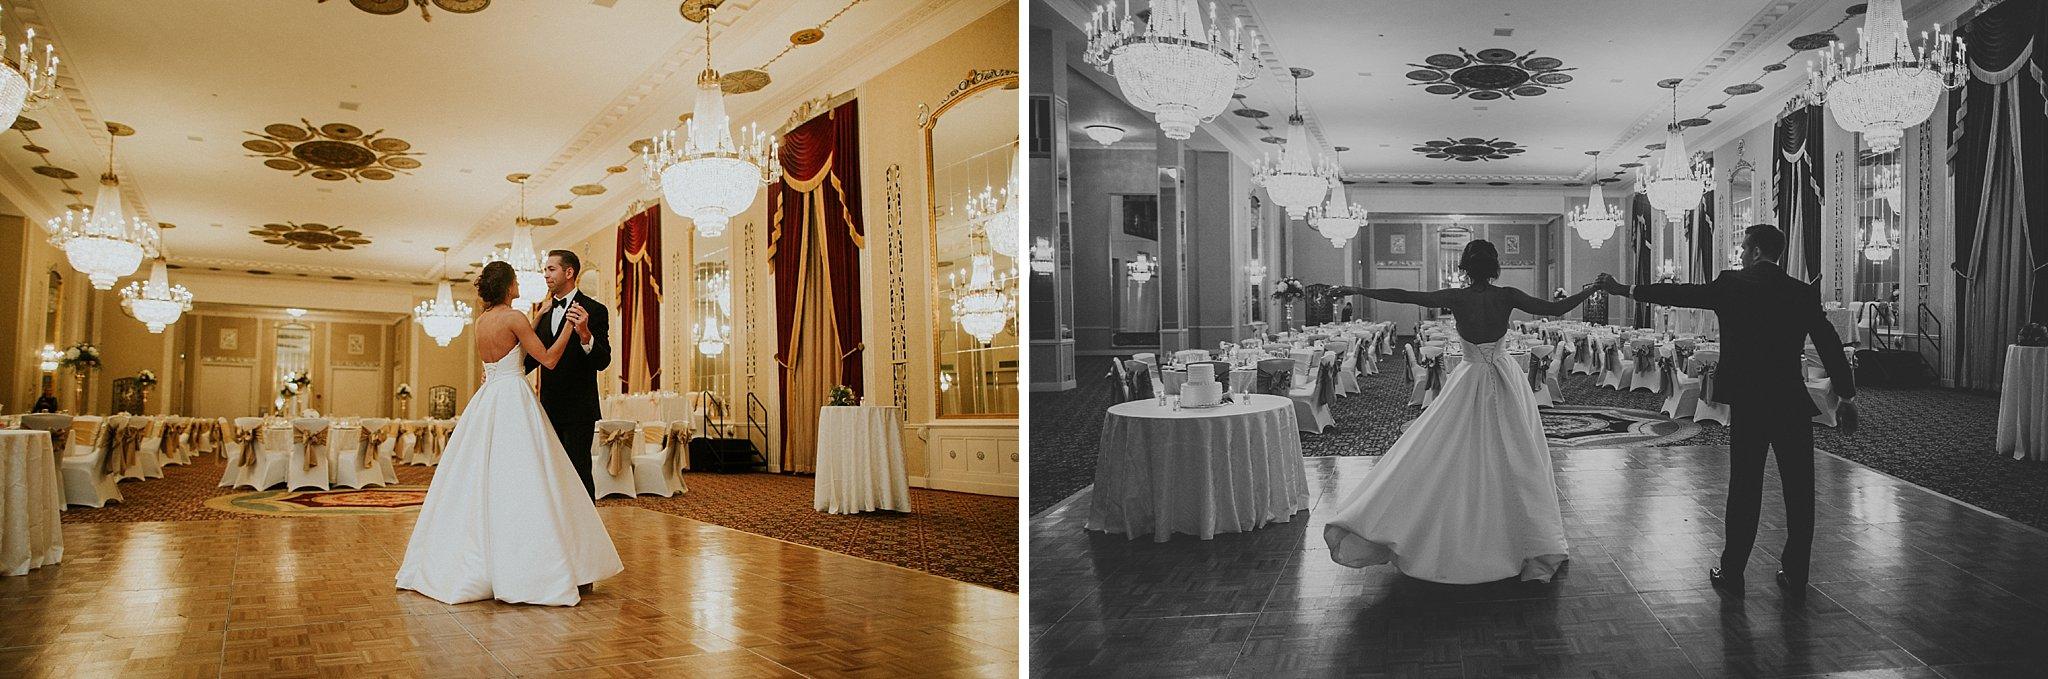 Matt-Lauren_St-Marys_Hilton-City-Center-Milwaukee-Wedding_liller-photo_0065.jpg